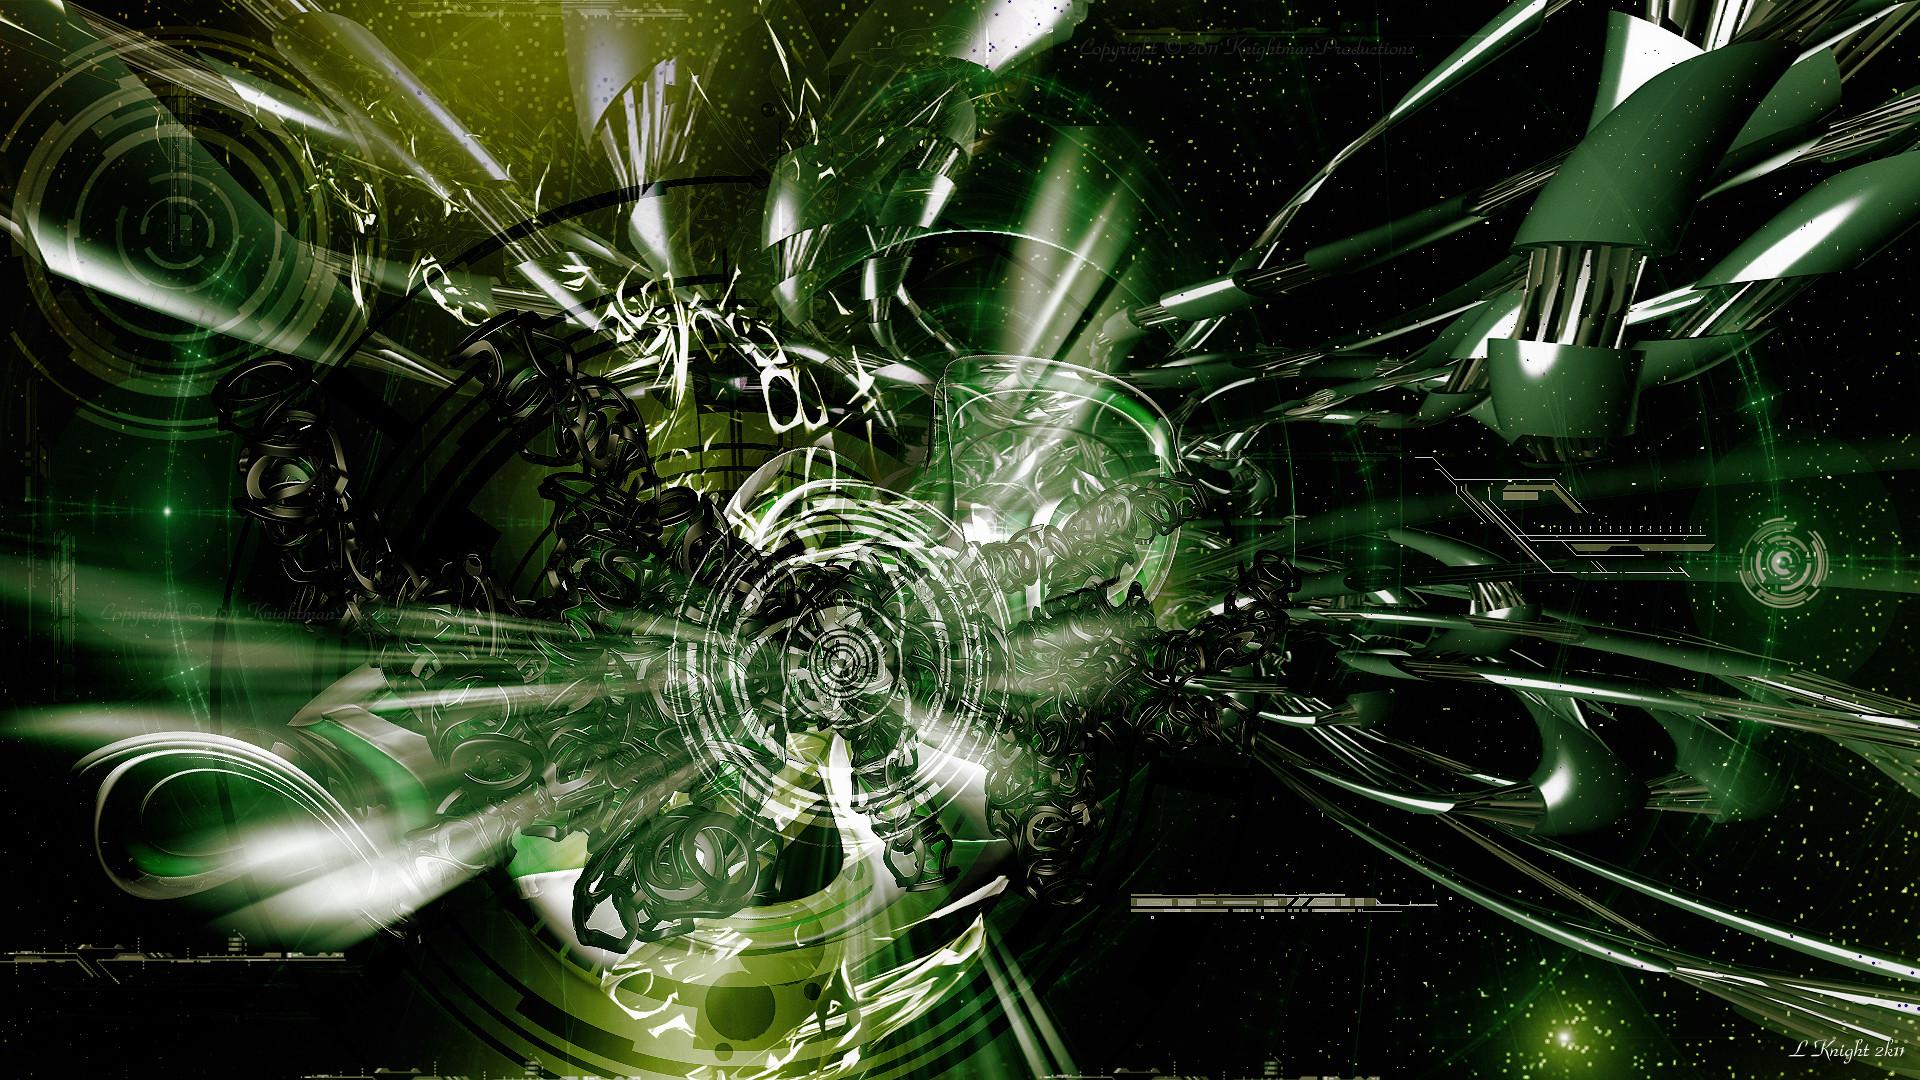 Techno Wallpaper Green